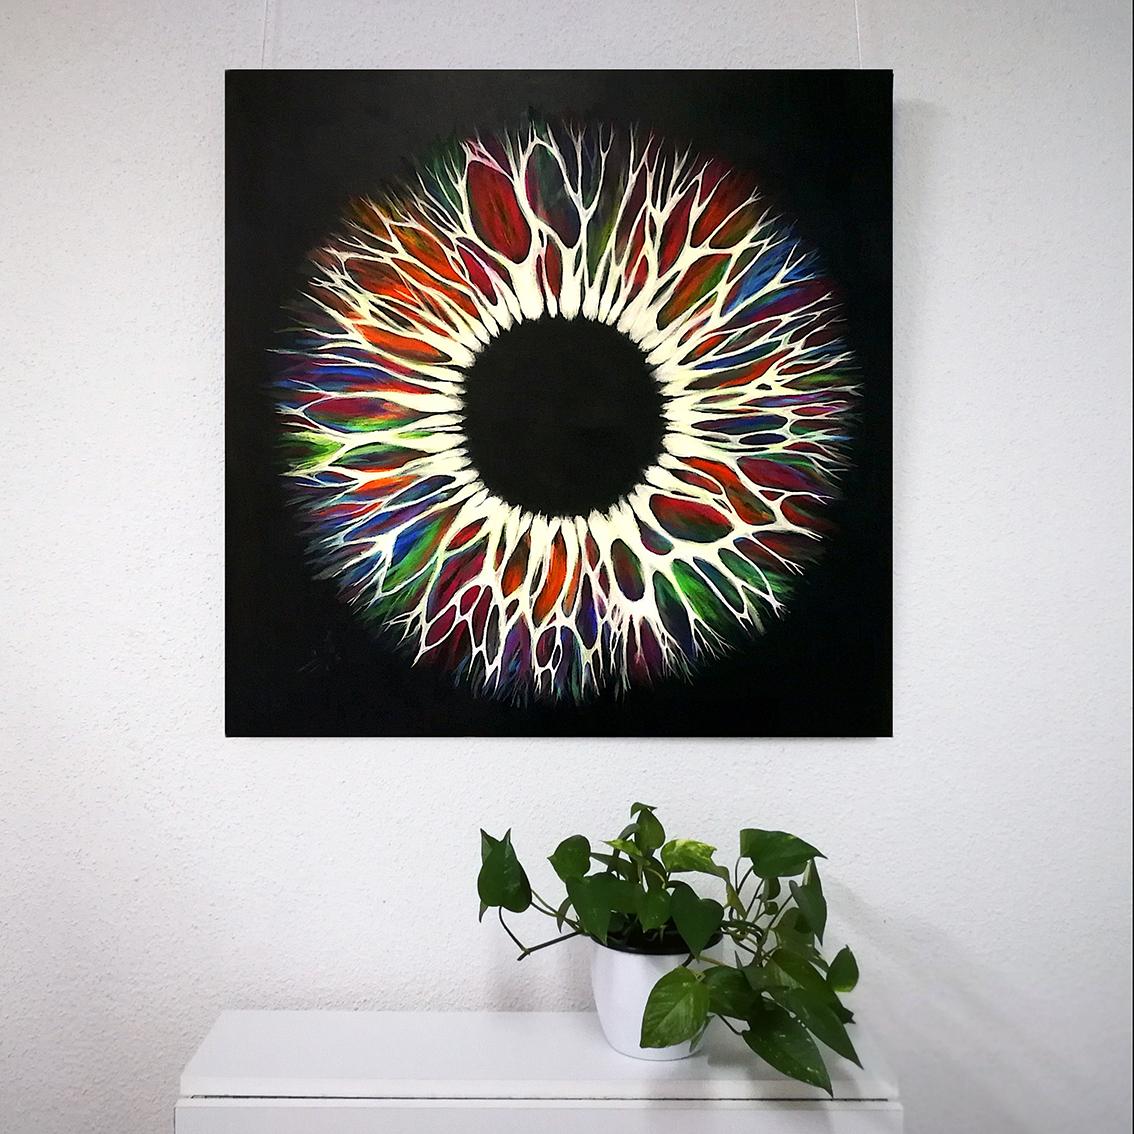 Vicky-Casellas.-Iris-fluorescente.-Arte-fluorescente.-80x80-cm.-Acrílico-sobre-lienzo-1